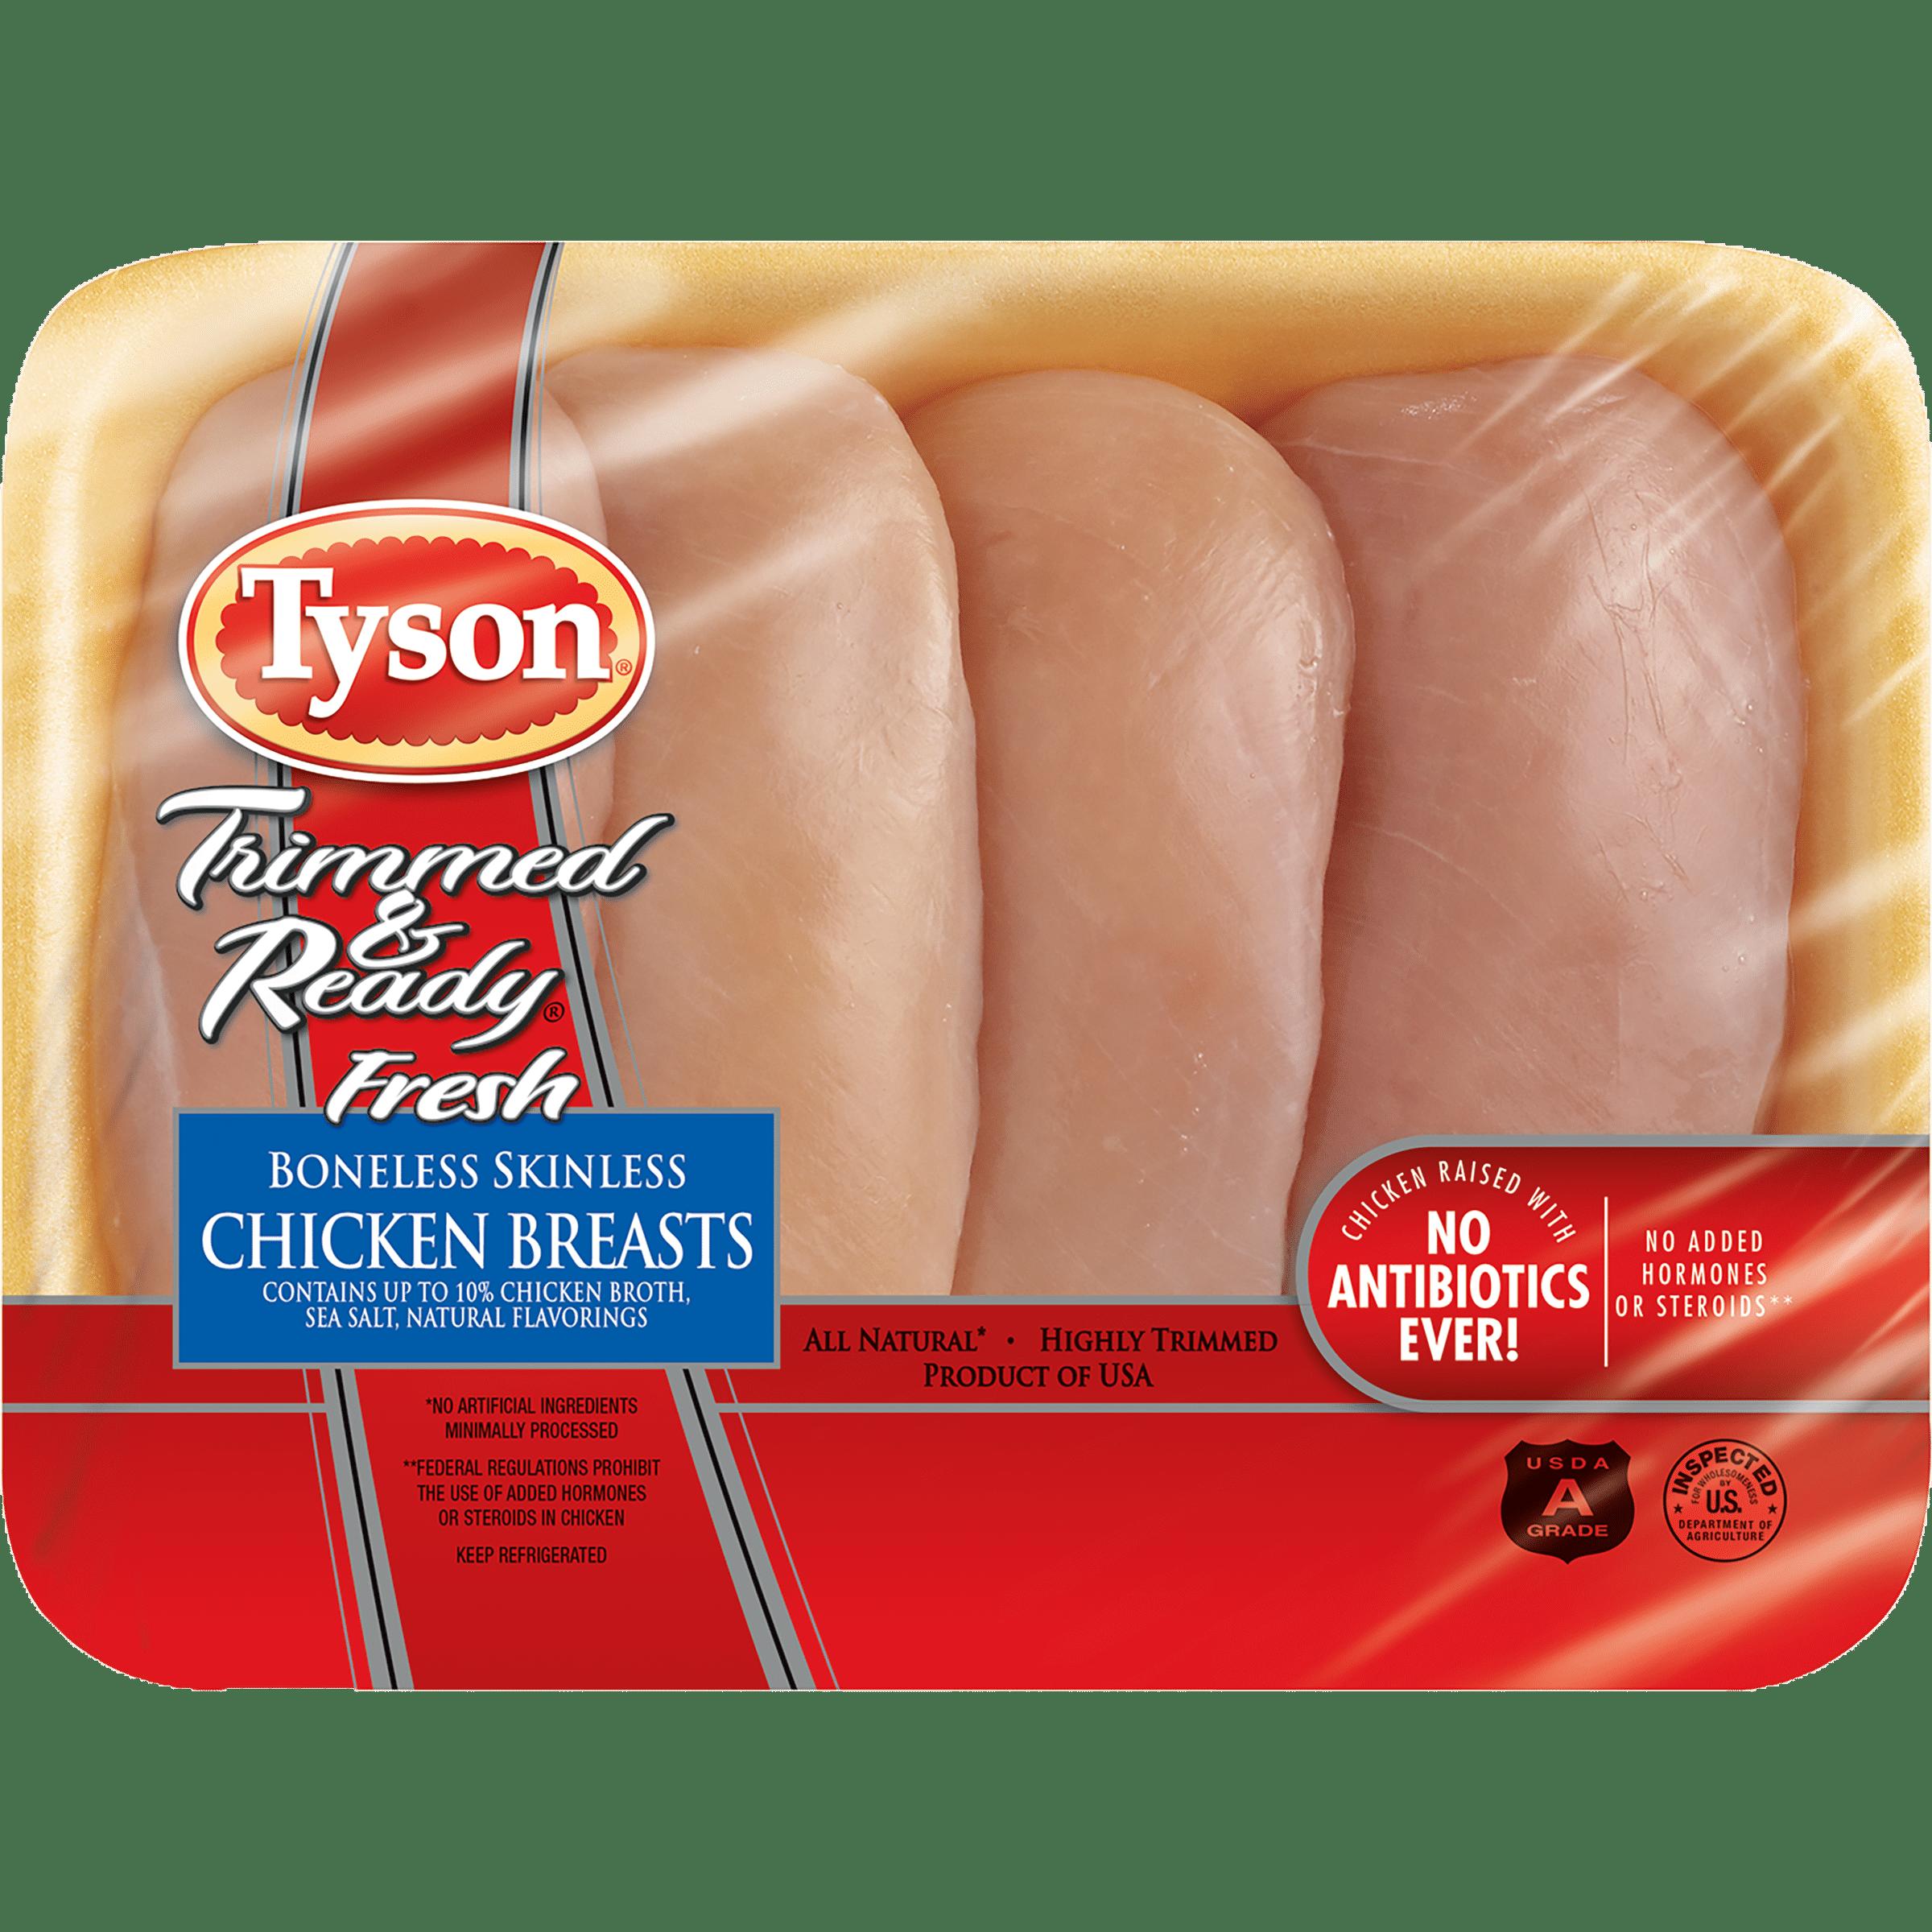 Tyson® Trimmed & Ready Fresh Boneless Skinless Chicken Breasts, 1.2-1.8 lb